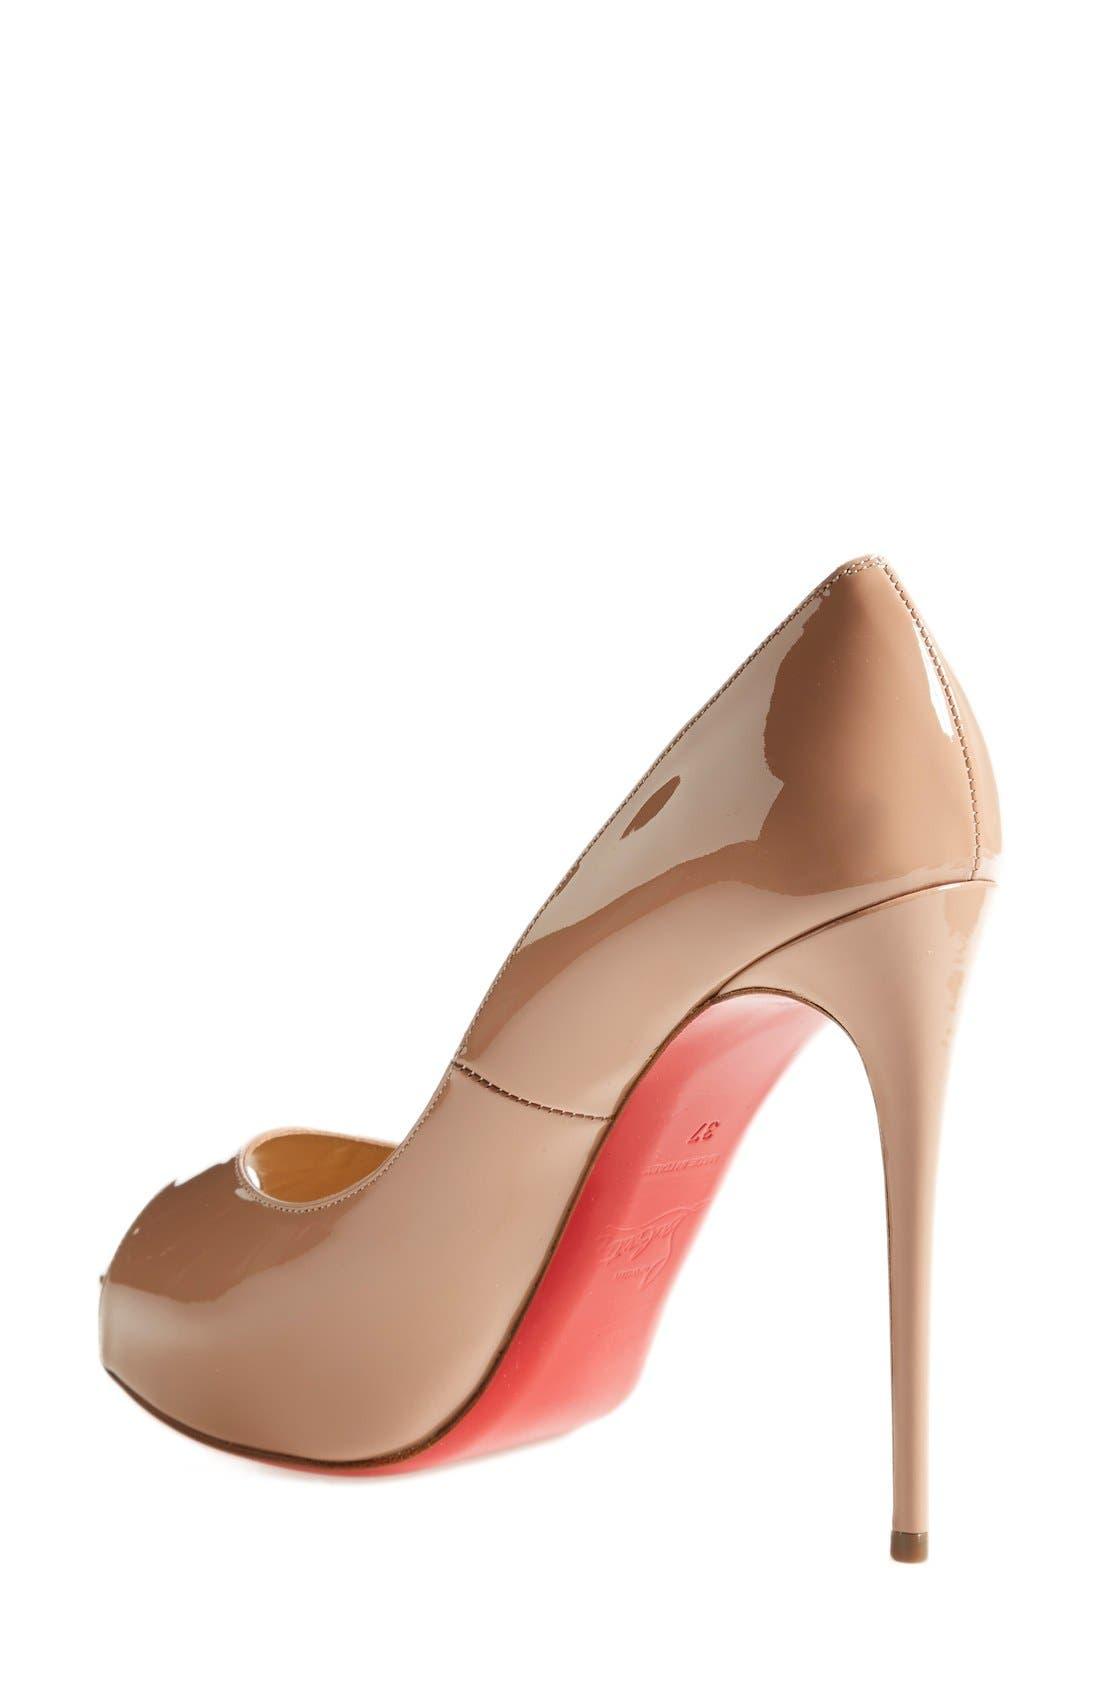 ebdb7708b94 Women s Party   Evening Heels